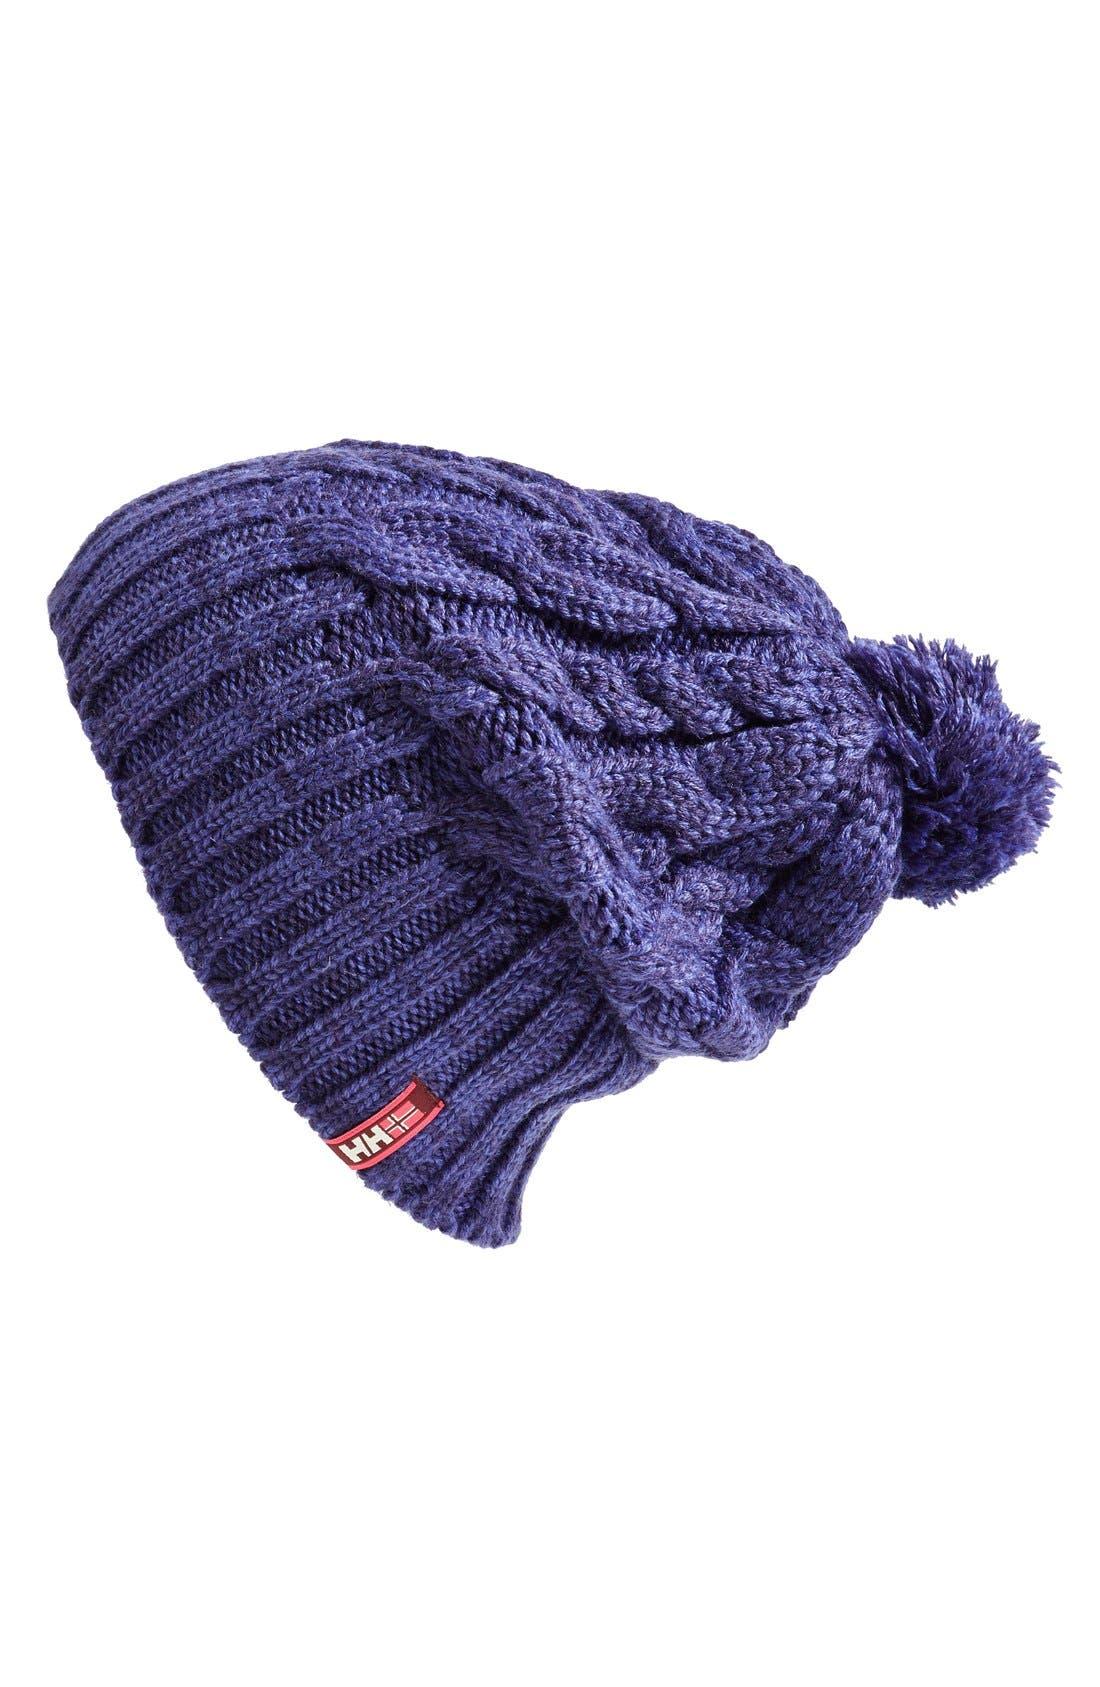 Main Image - Helly Hansen 'Montreal' Chunky Knit Beanie